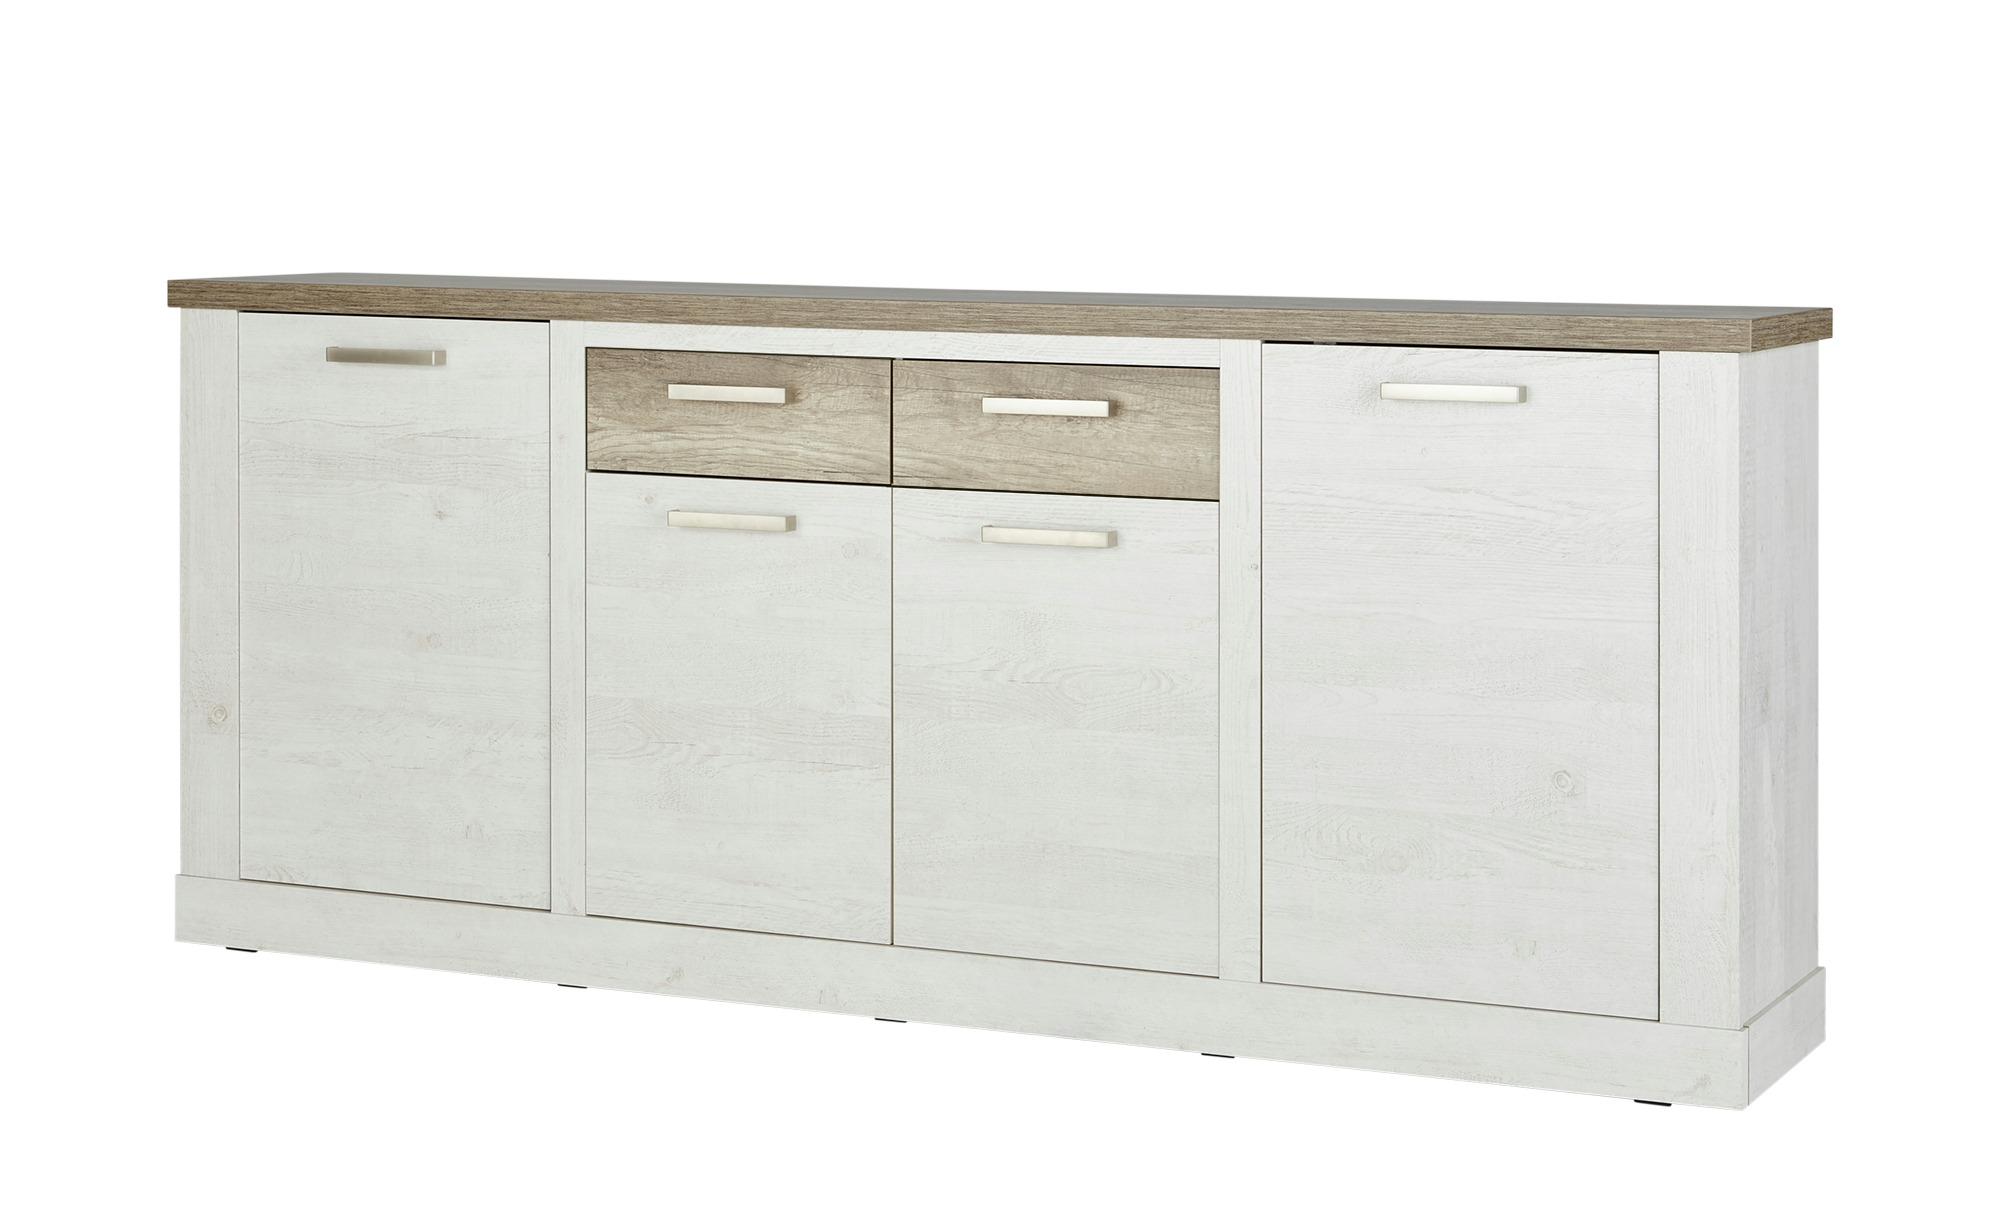 Sideboard  Viareggio ¦ holzfarben ¦ Maße (cm): B: 213 H: 90 T: 41 Kommoden & Sideboards > Sideboards - Höffner